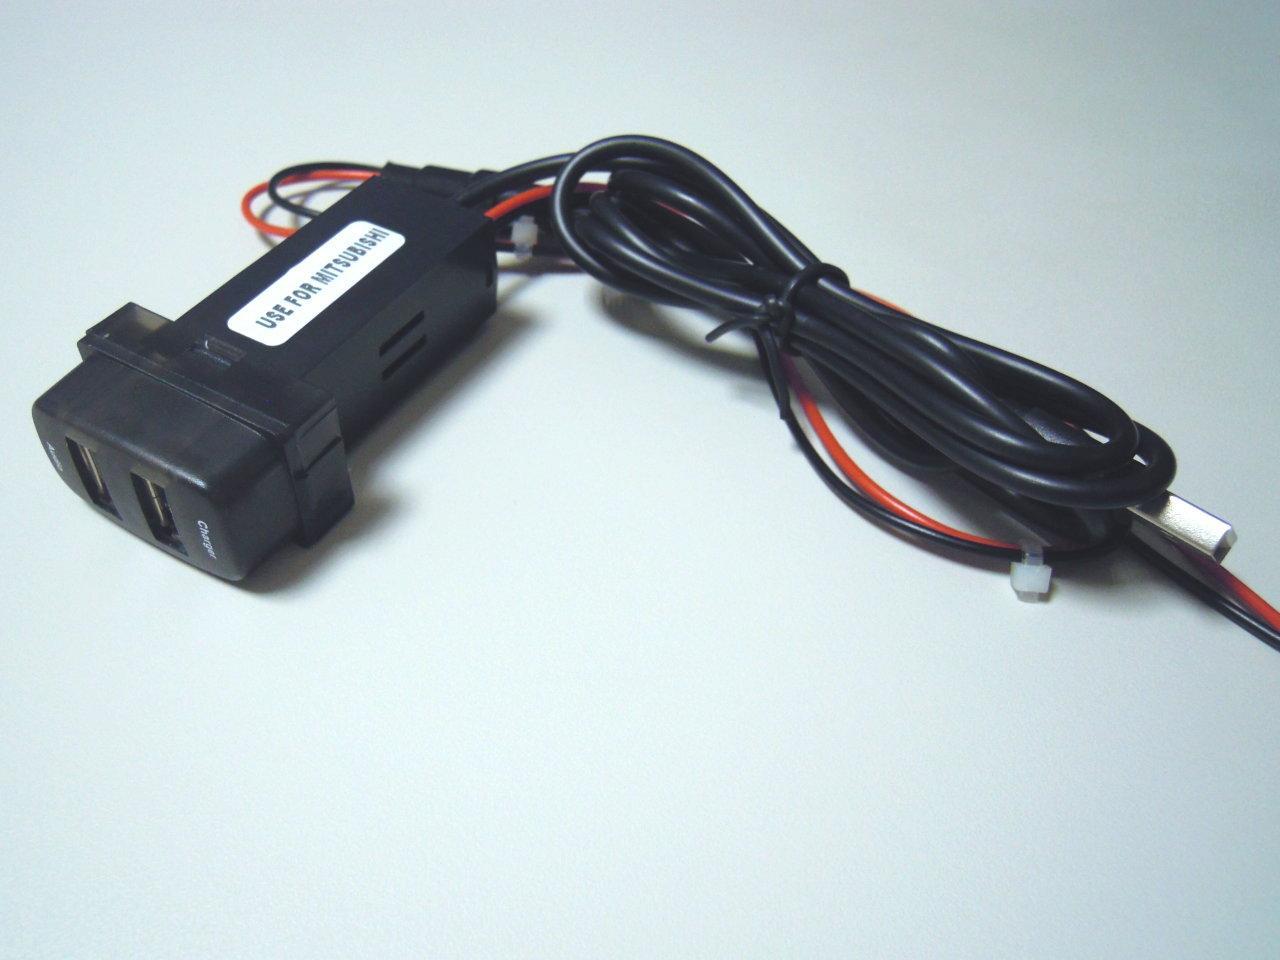 不明 三菱車用USB充電器付USB延長ポート